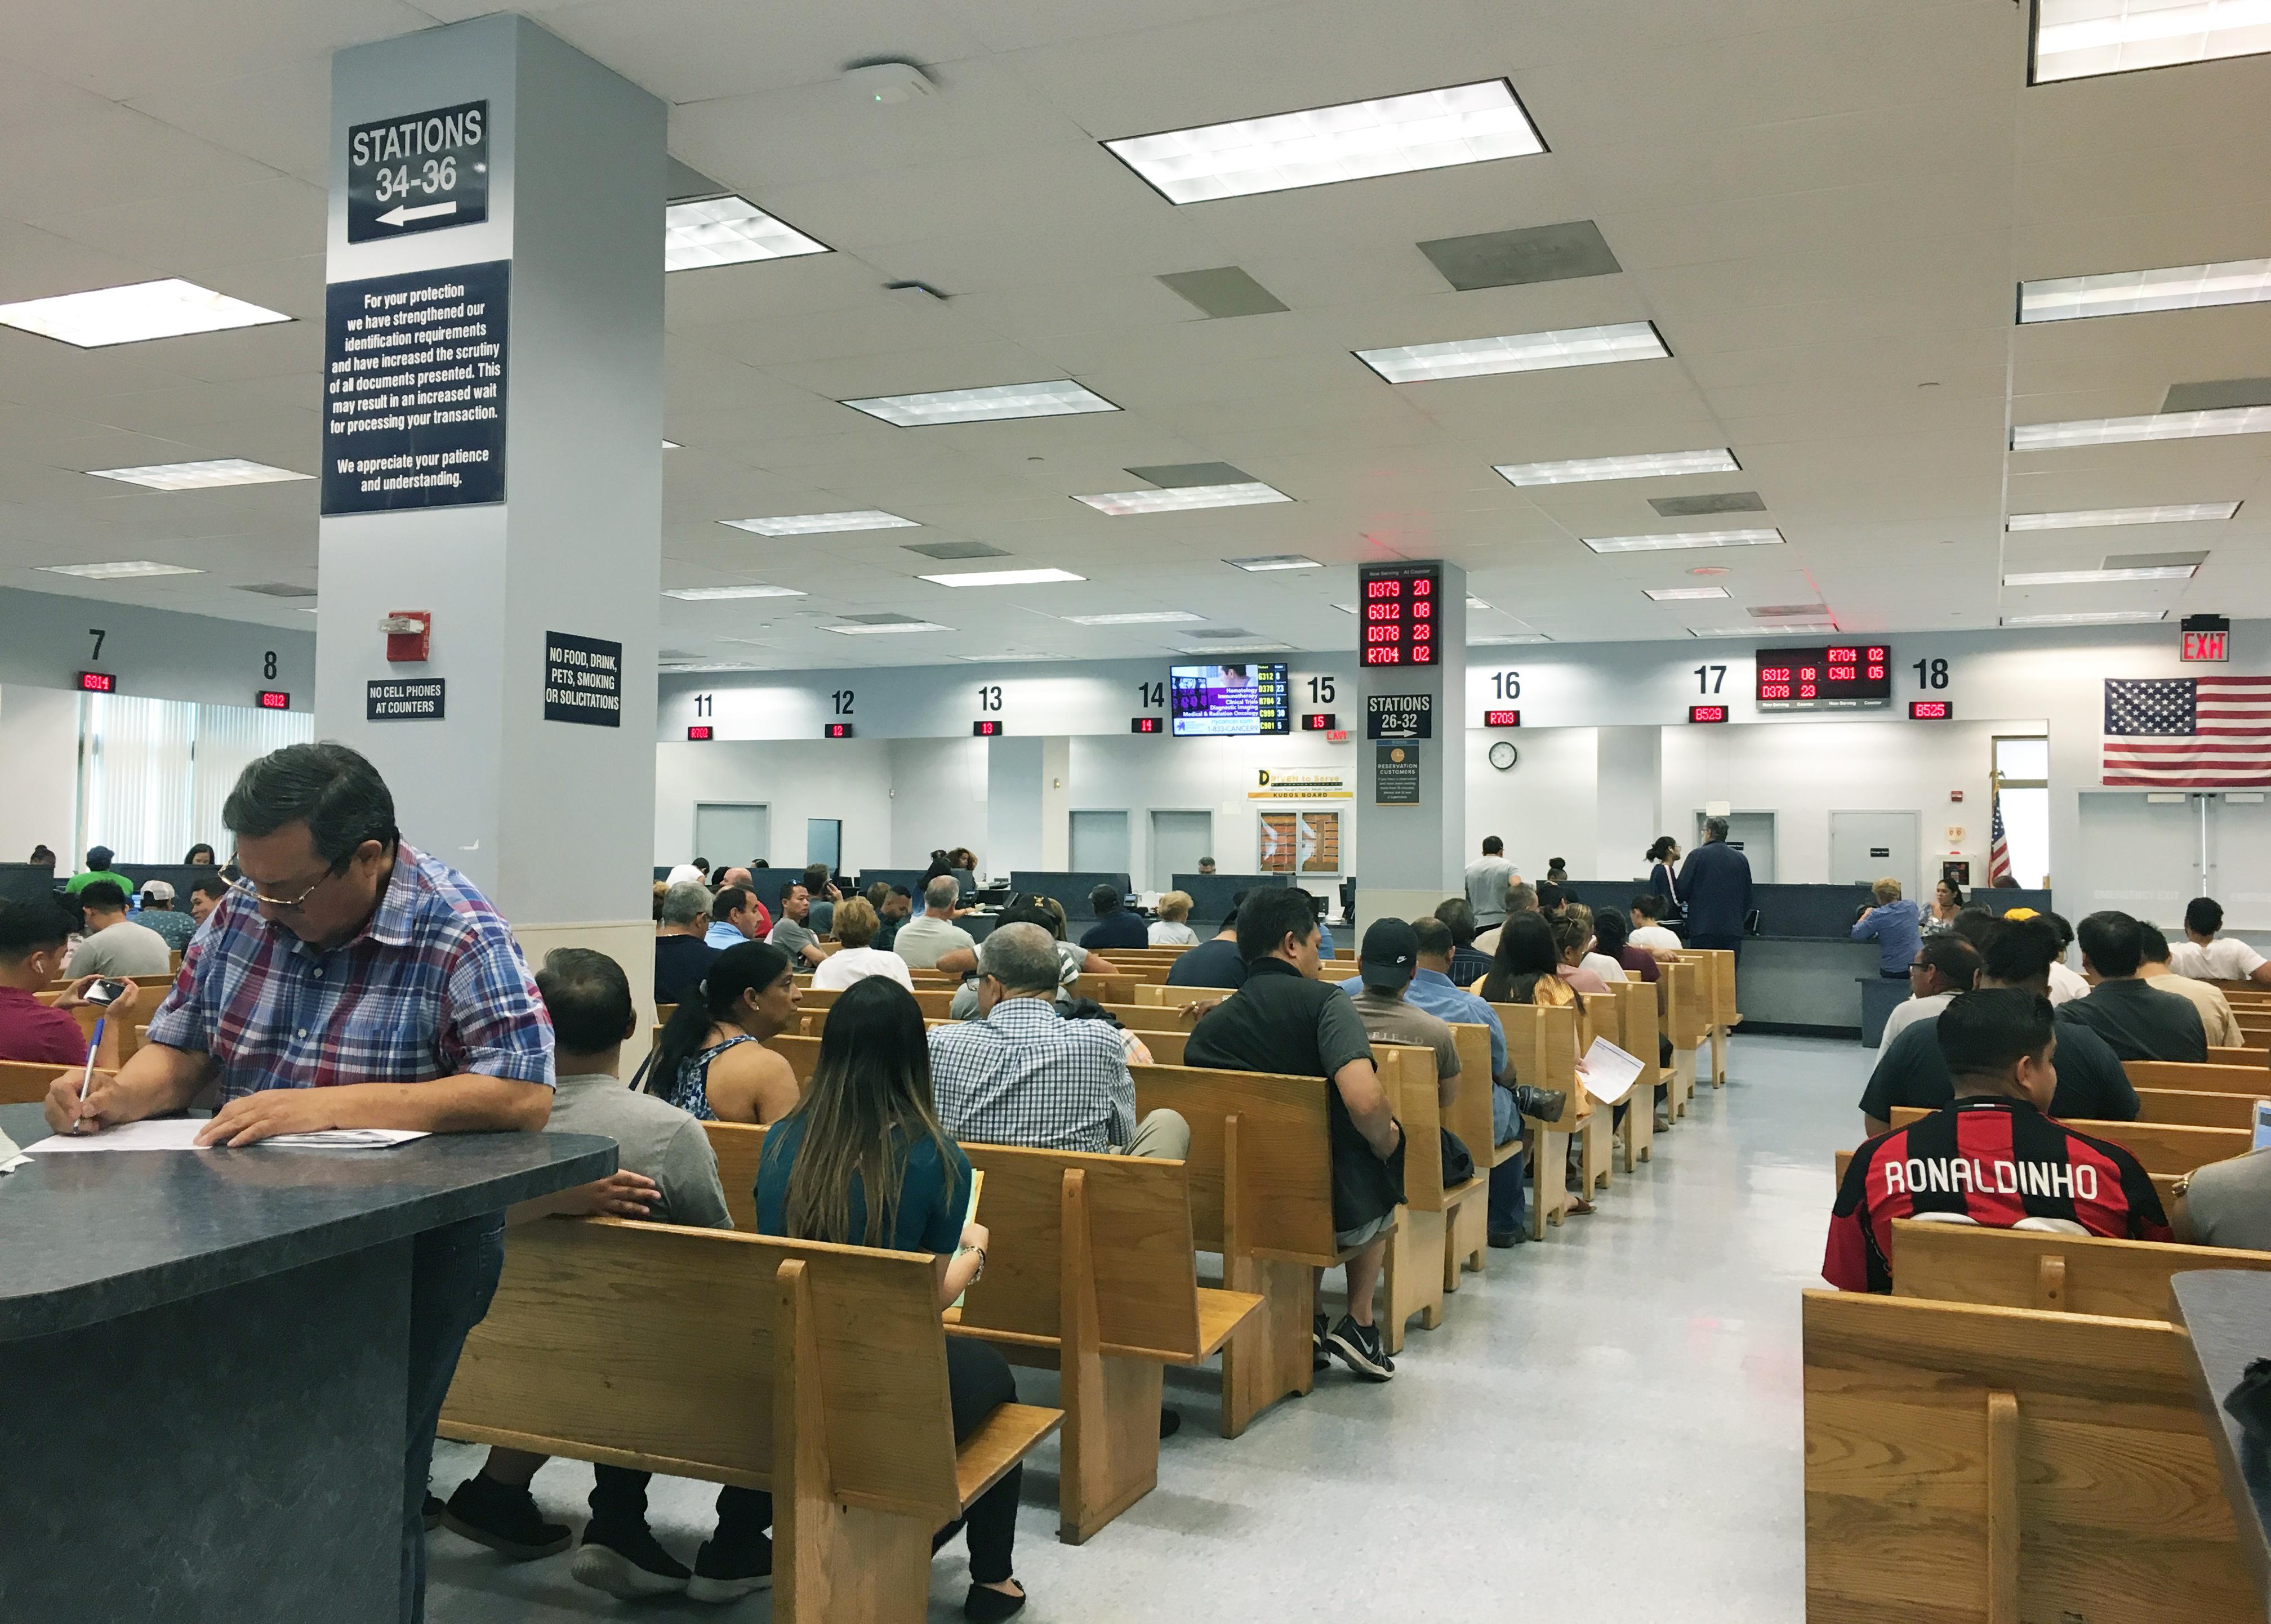 dmv, 紐約, 申請駕照, 文件, 開車